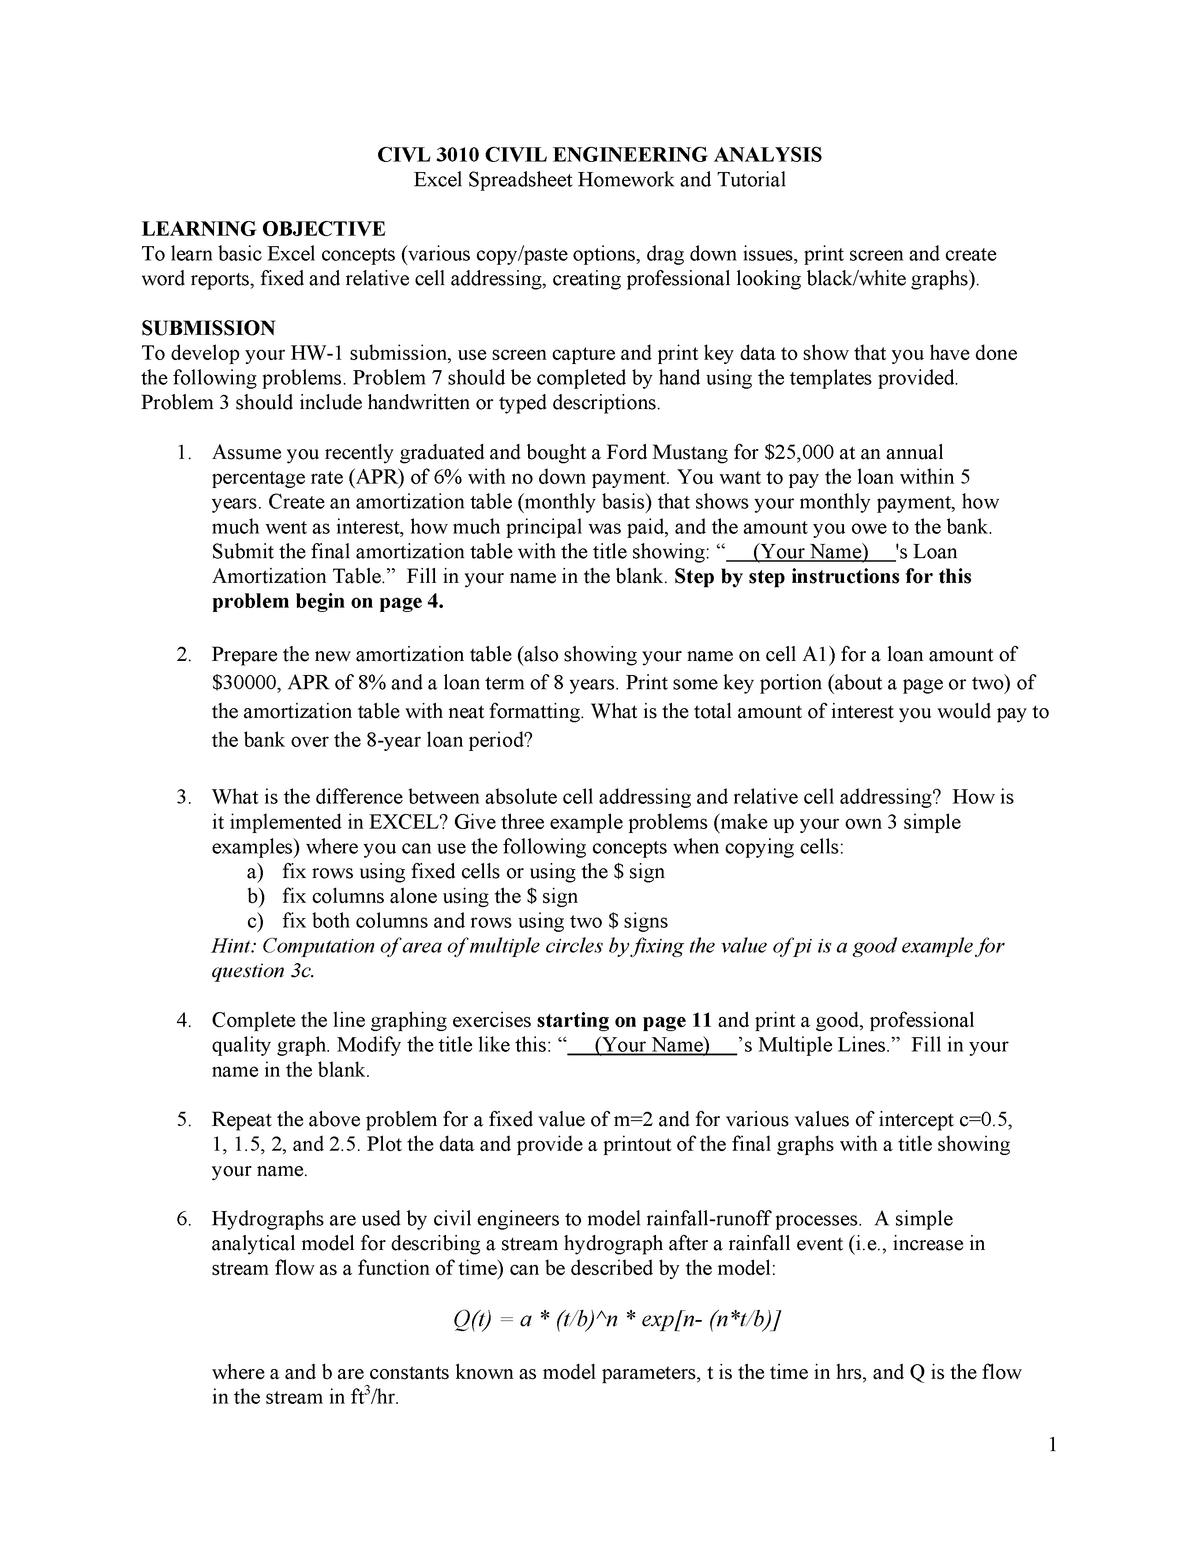 Civil 3010 spreadsheet homework and tutorial - ENGR 2070